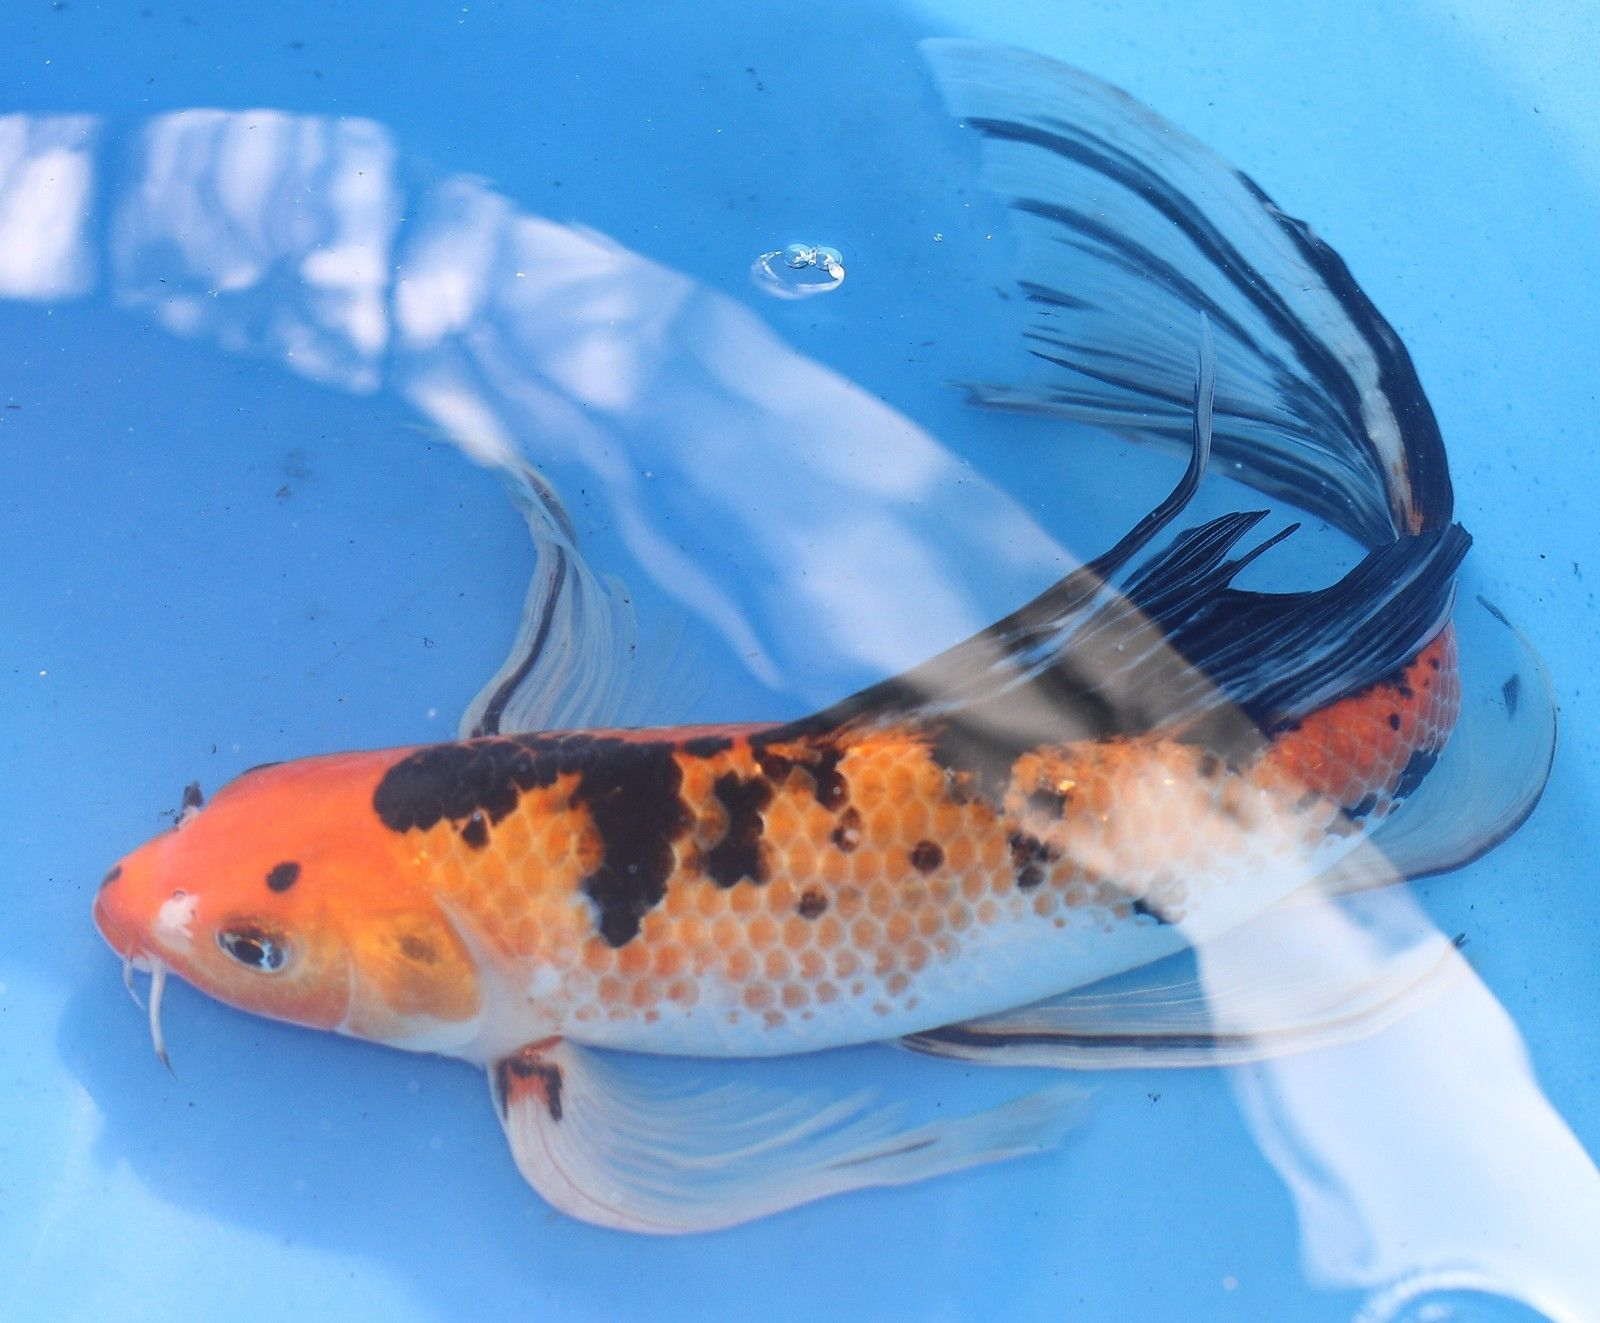 11 inch hi utsuri butterfly fin live koi fish fko 55 for Koi fish tail